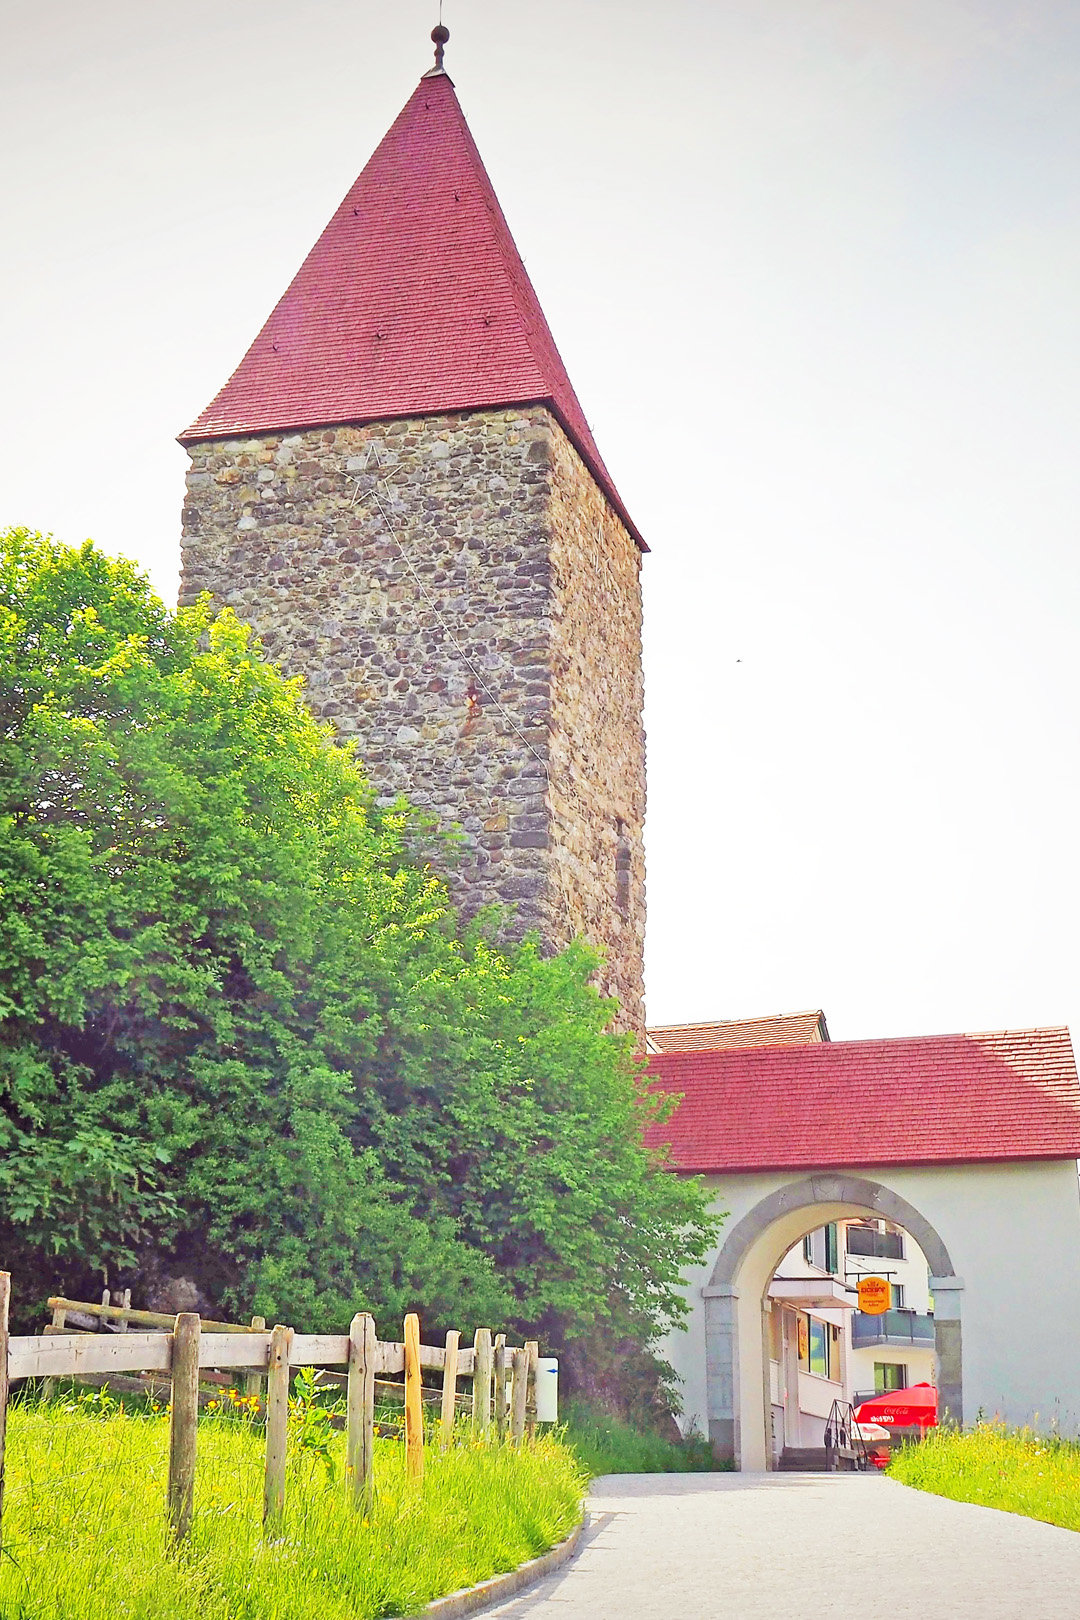 Letziturm tower